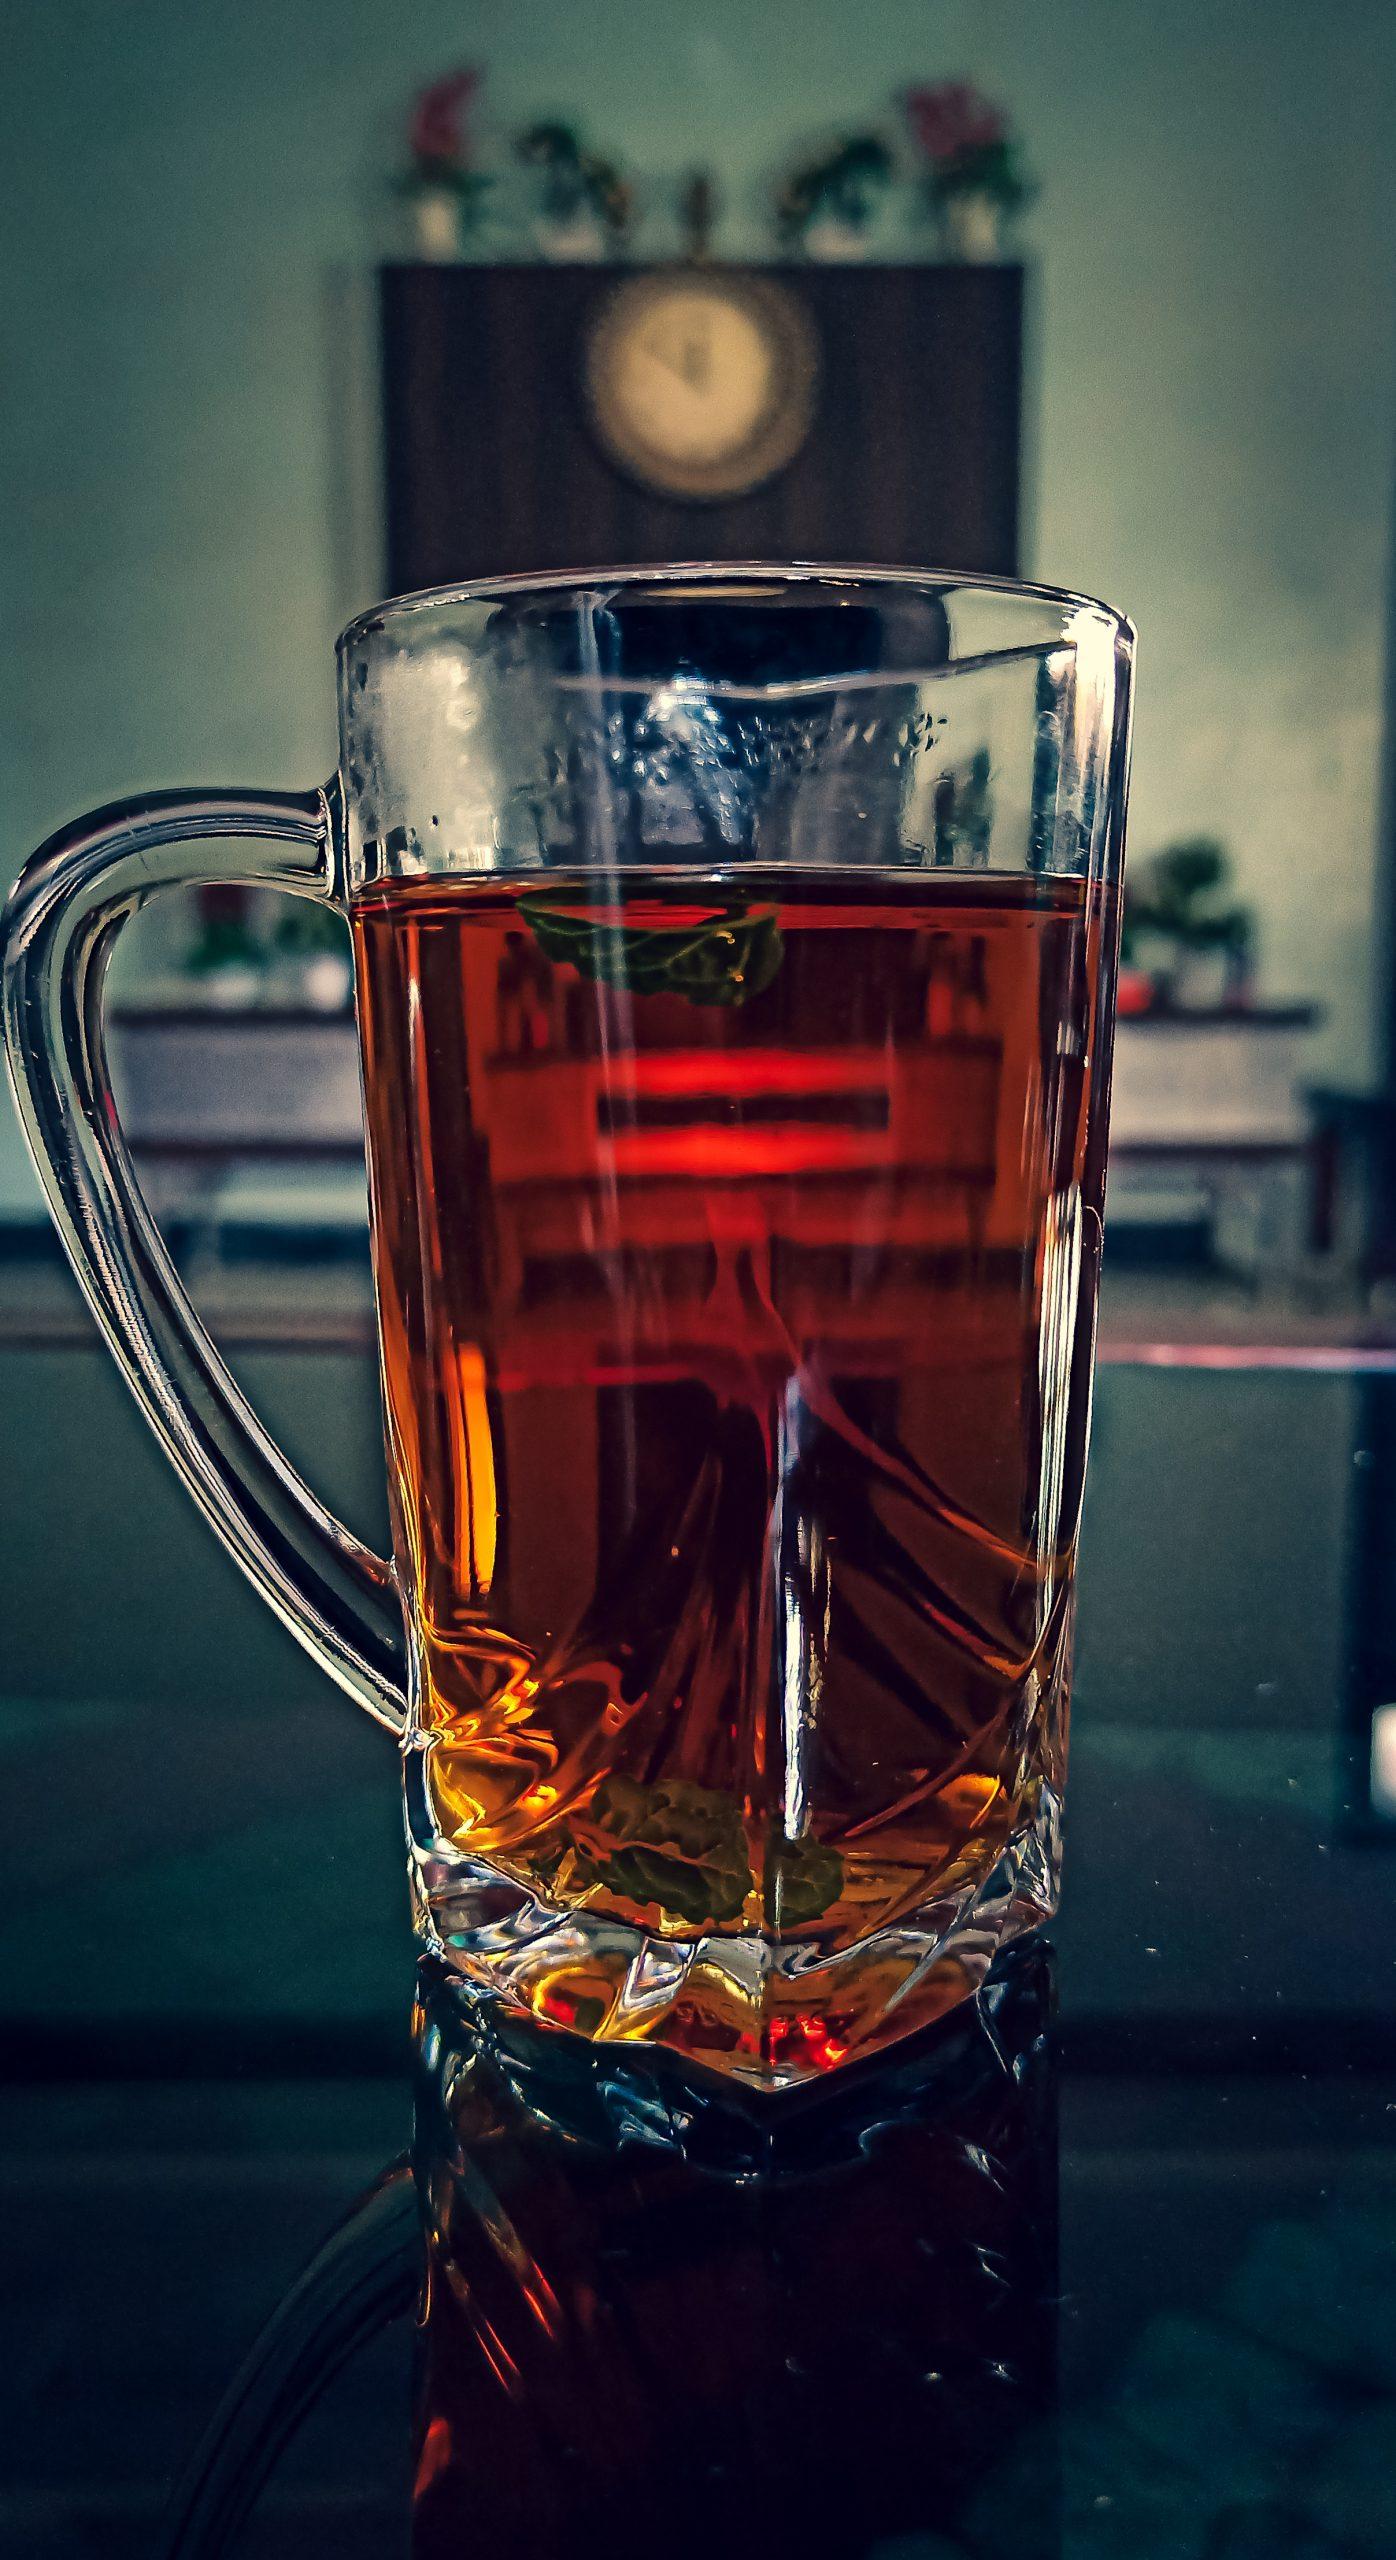 Lemon tea in a glass cup